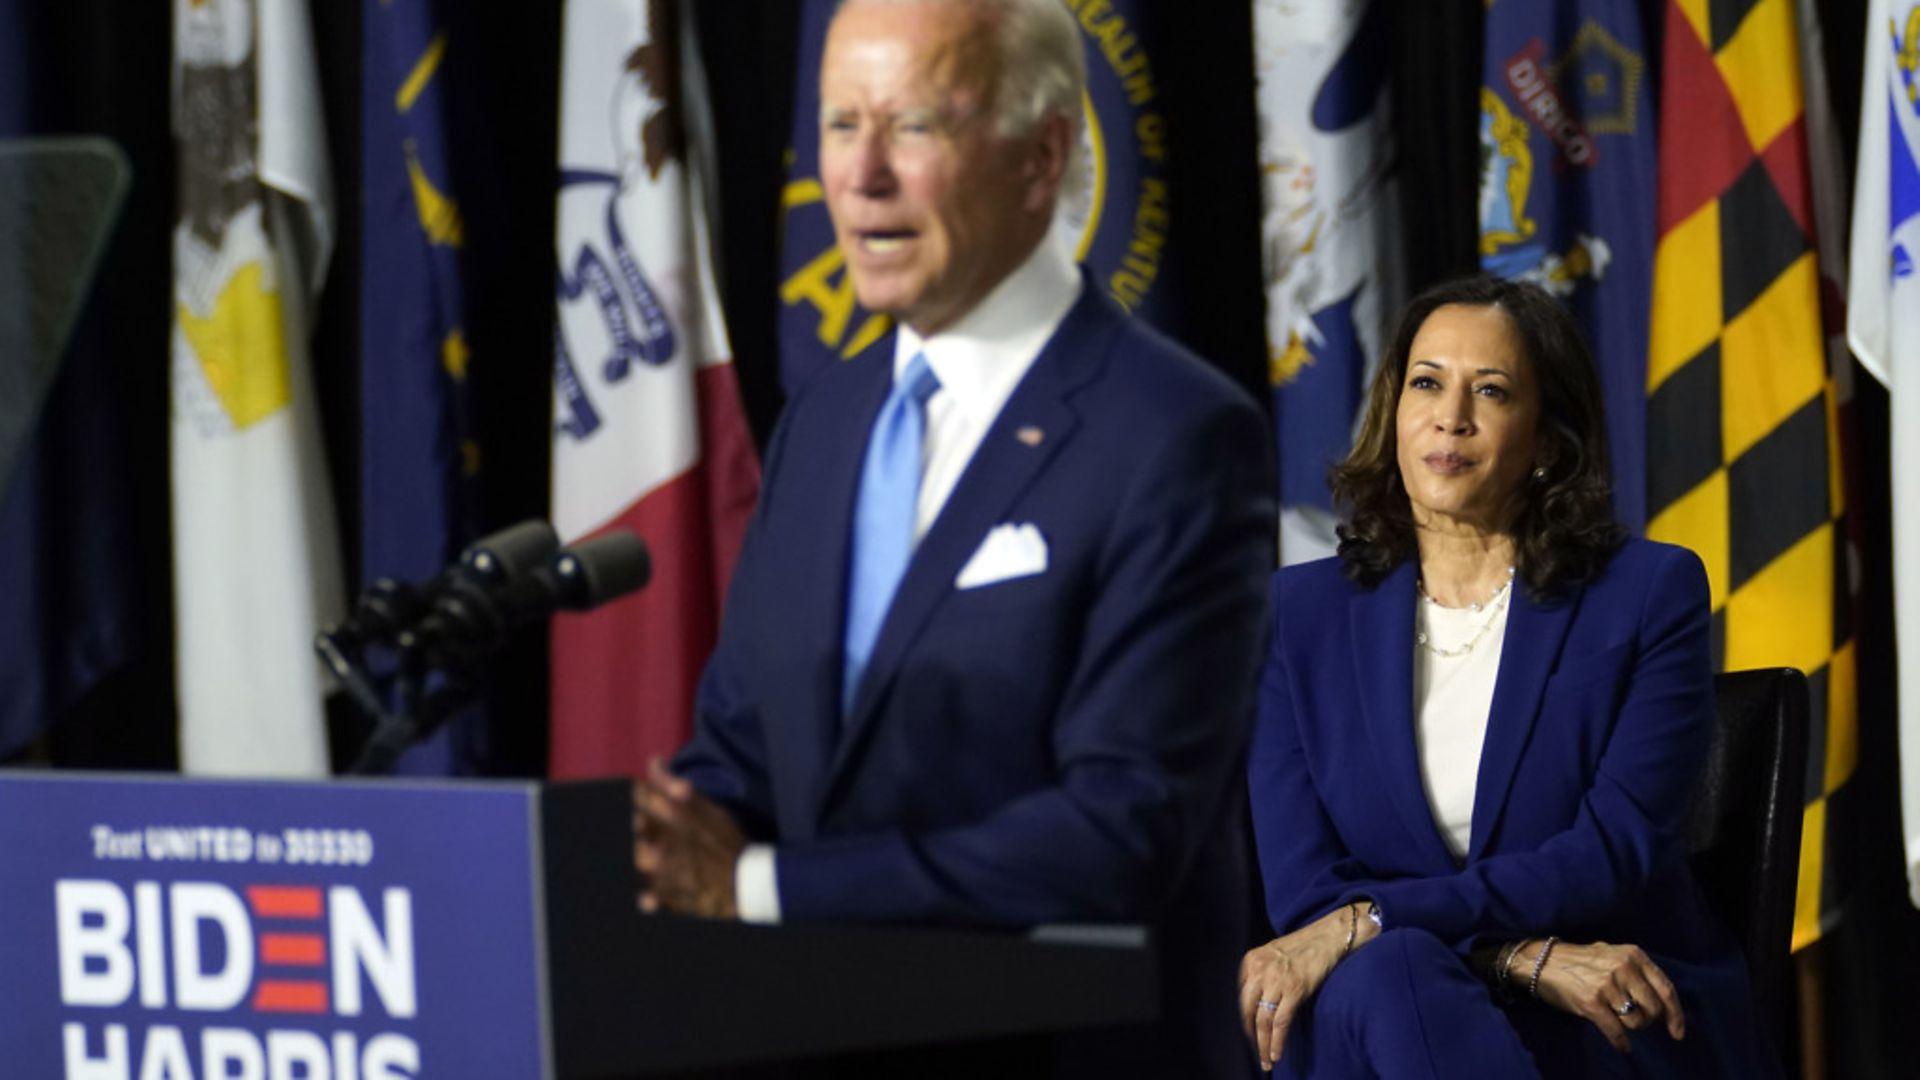 Joe Biden speaks during a campaign event with Kamala Harris - Credit: AP